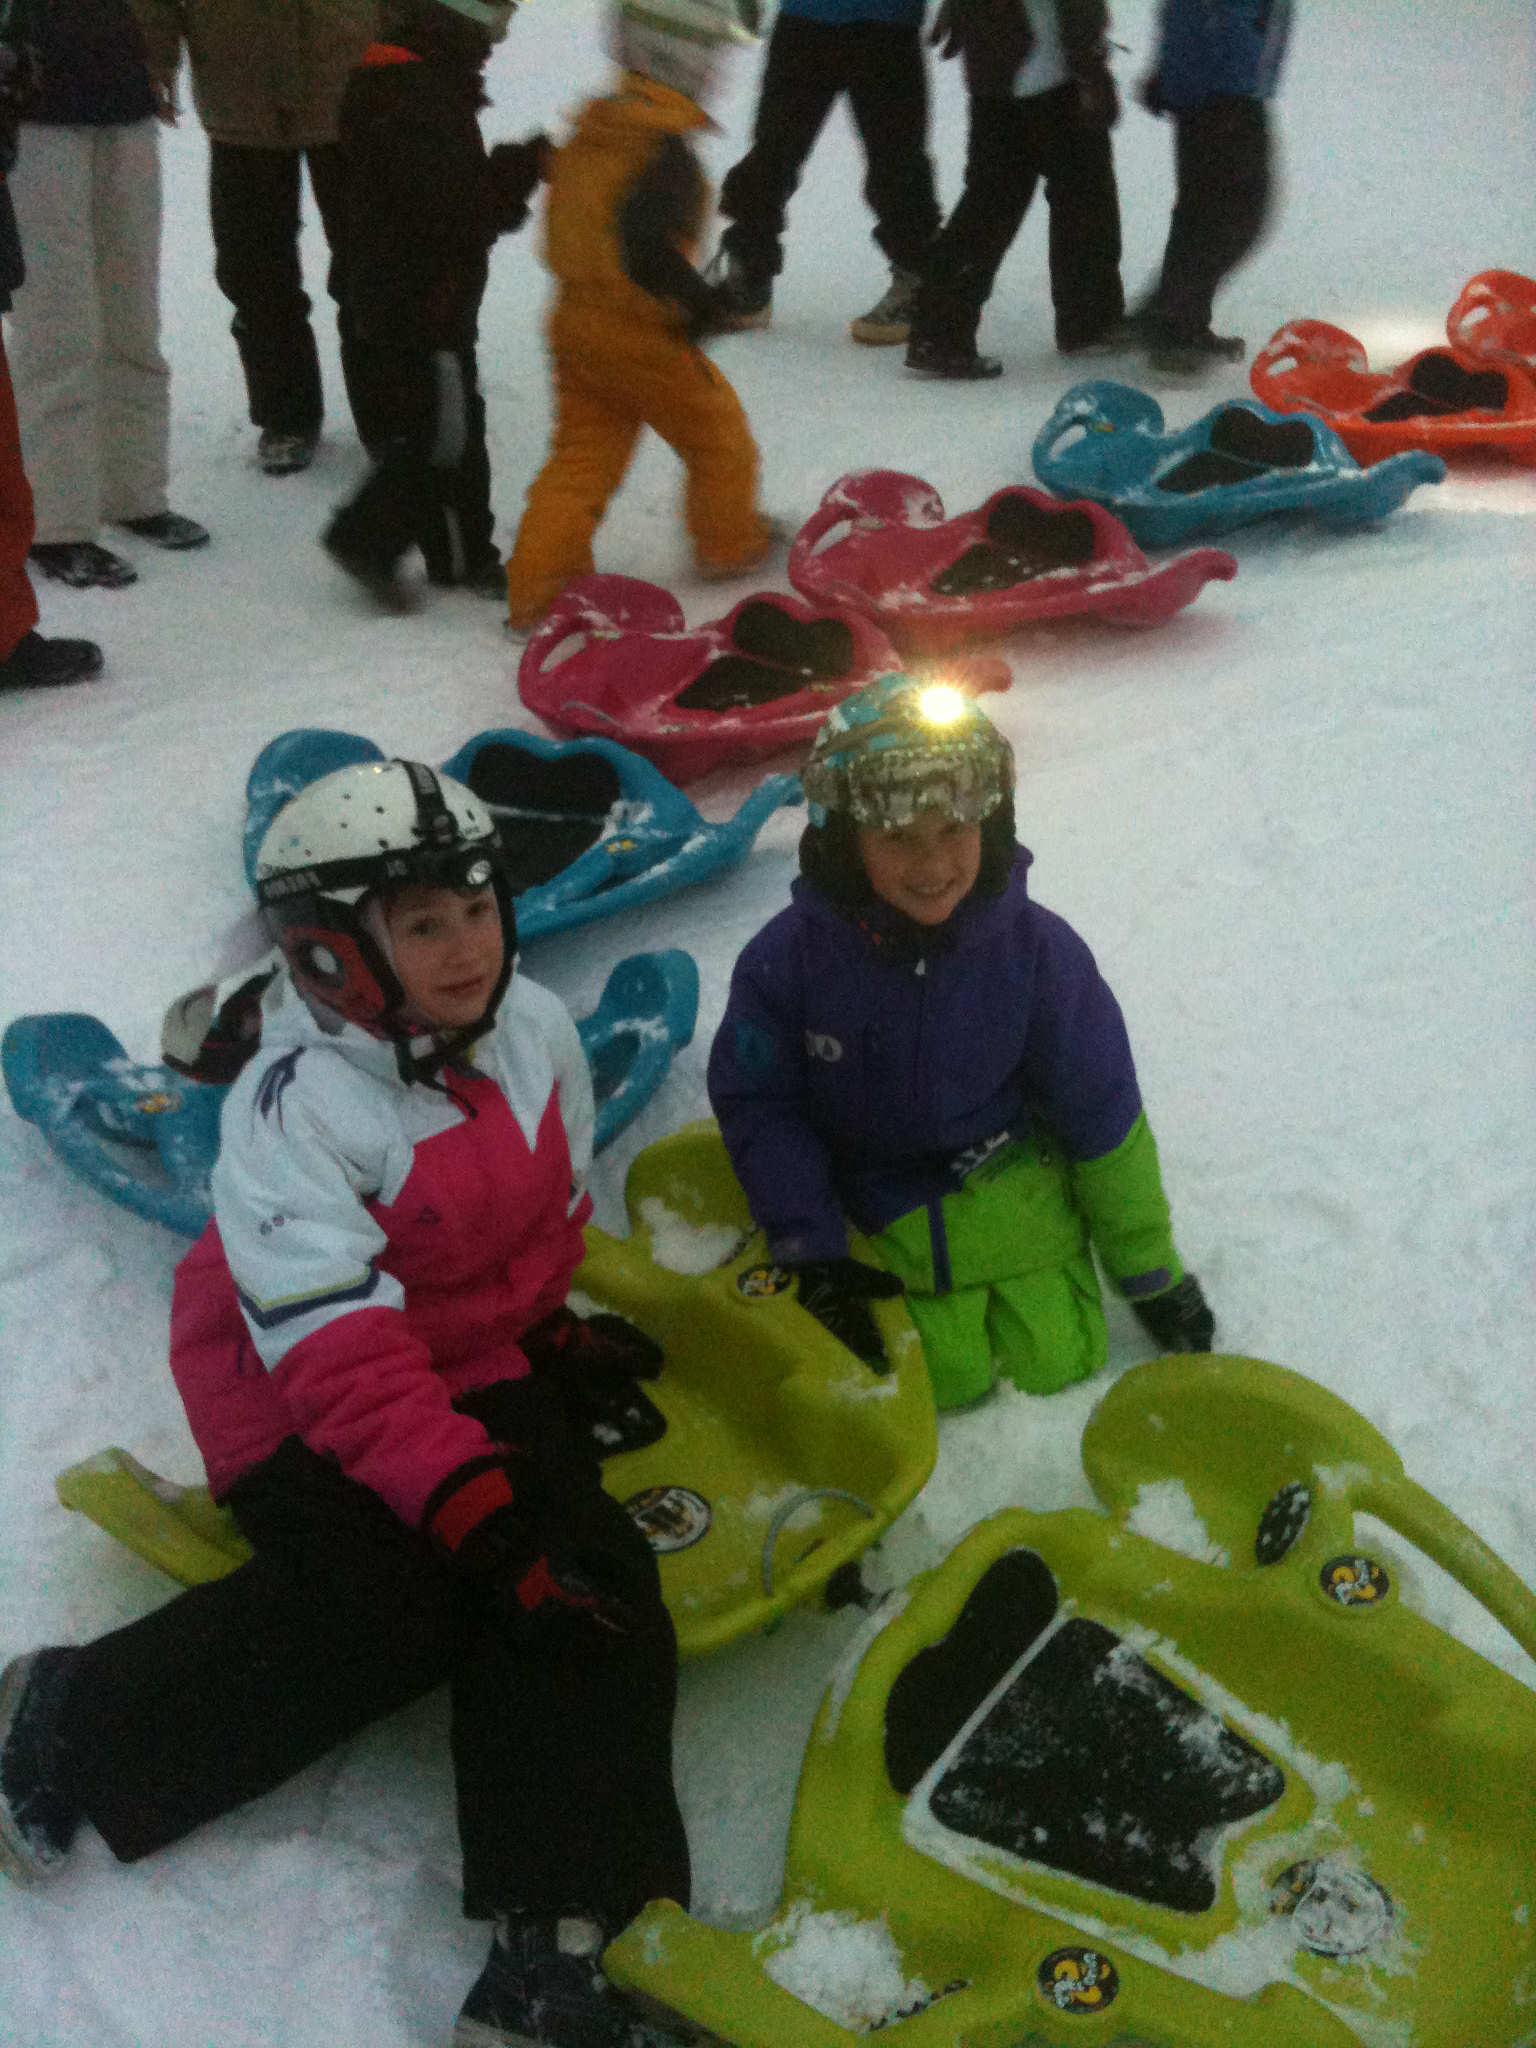 Snake Slide High Altitude Resorts La Plagne La Plagne